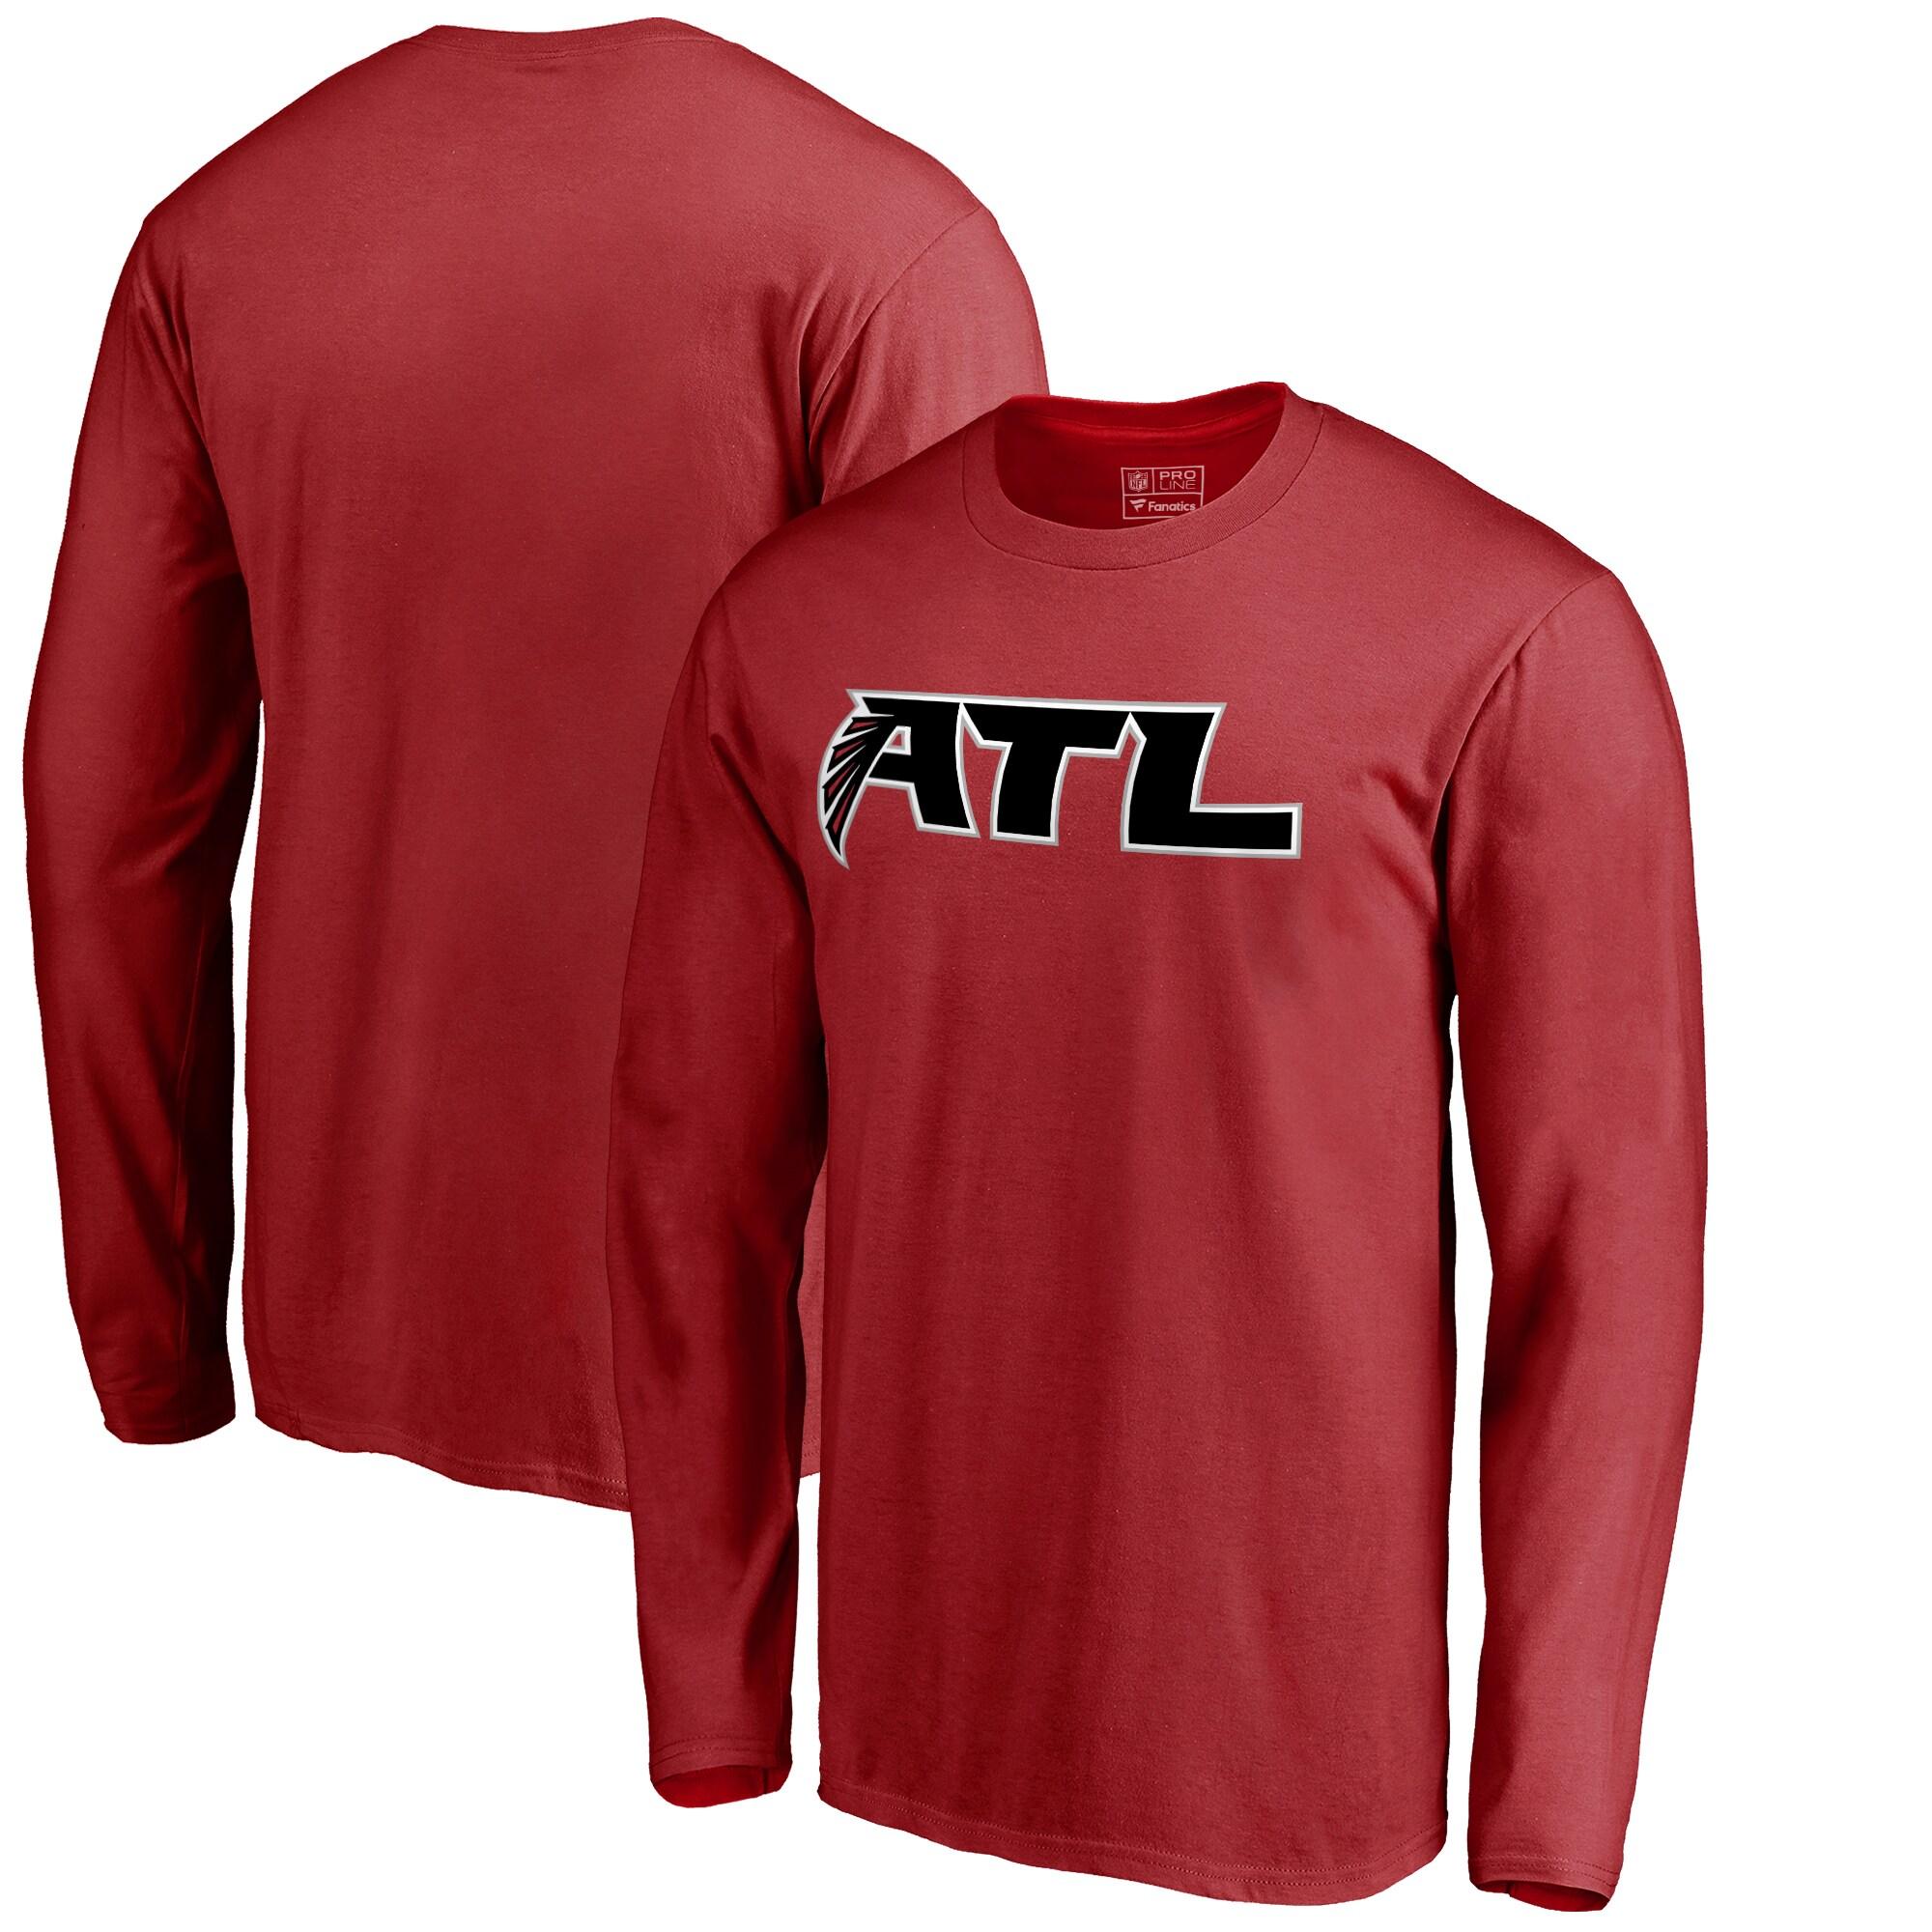 Atlanta Falcons NFL Pro Line Alternate Logo Long Sleeve T-Shirt - Red